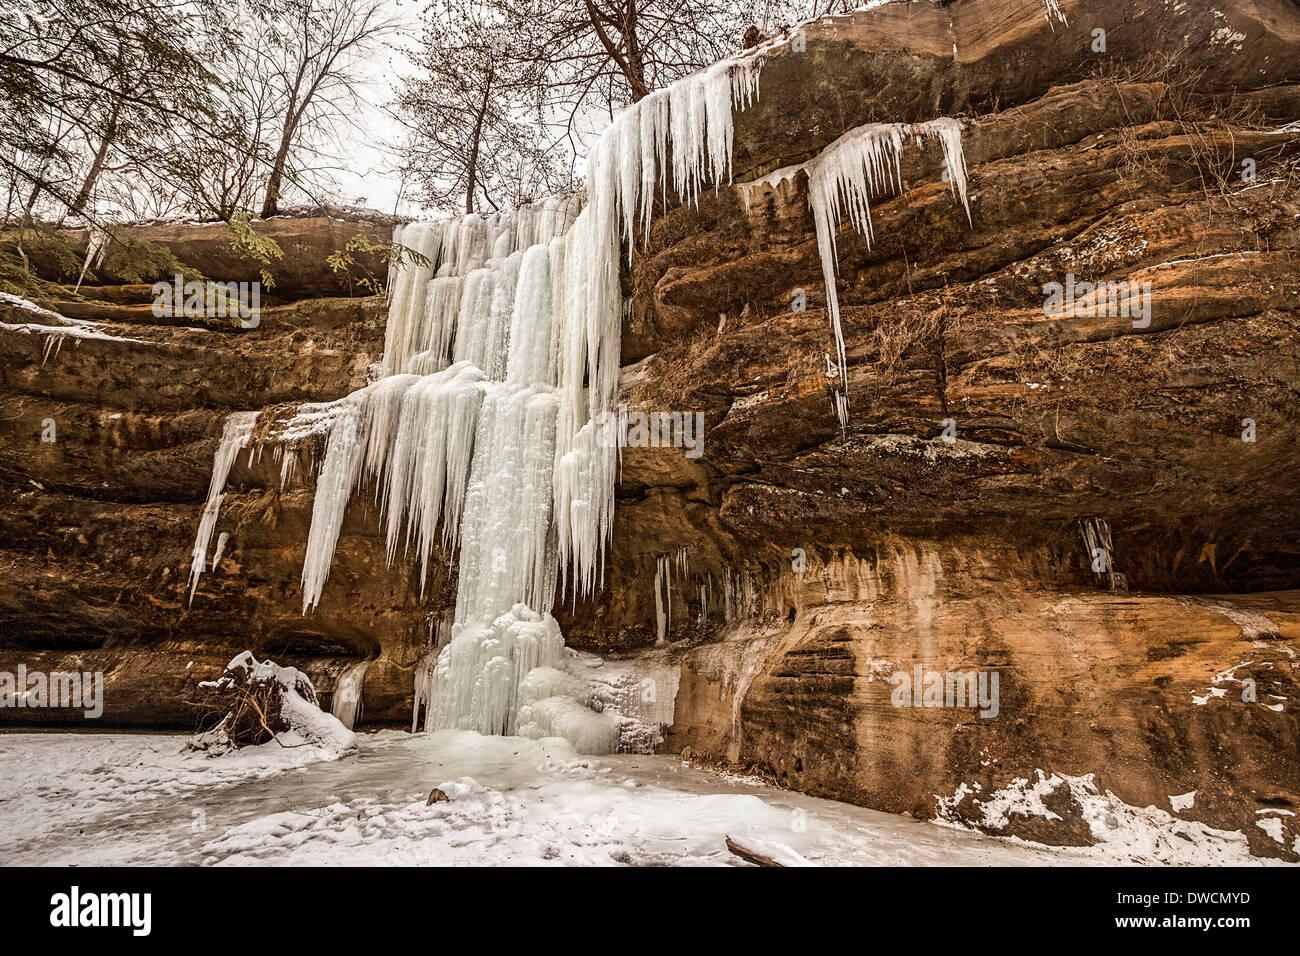 Congelate le Cascate Inferiori in inverno a Old Man's Cave, Hocking Hills State Park, Ohio, Stati Uniti d'America Foto Stock